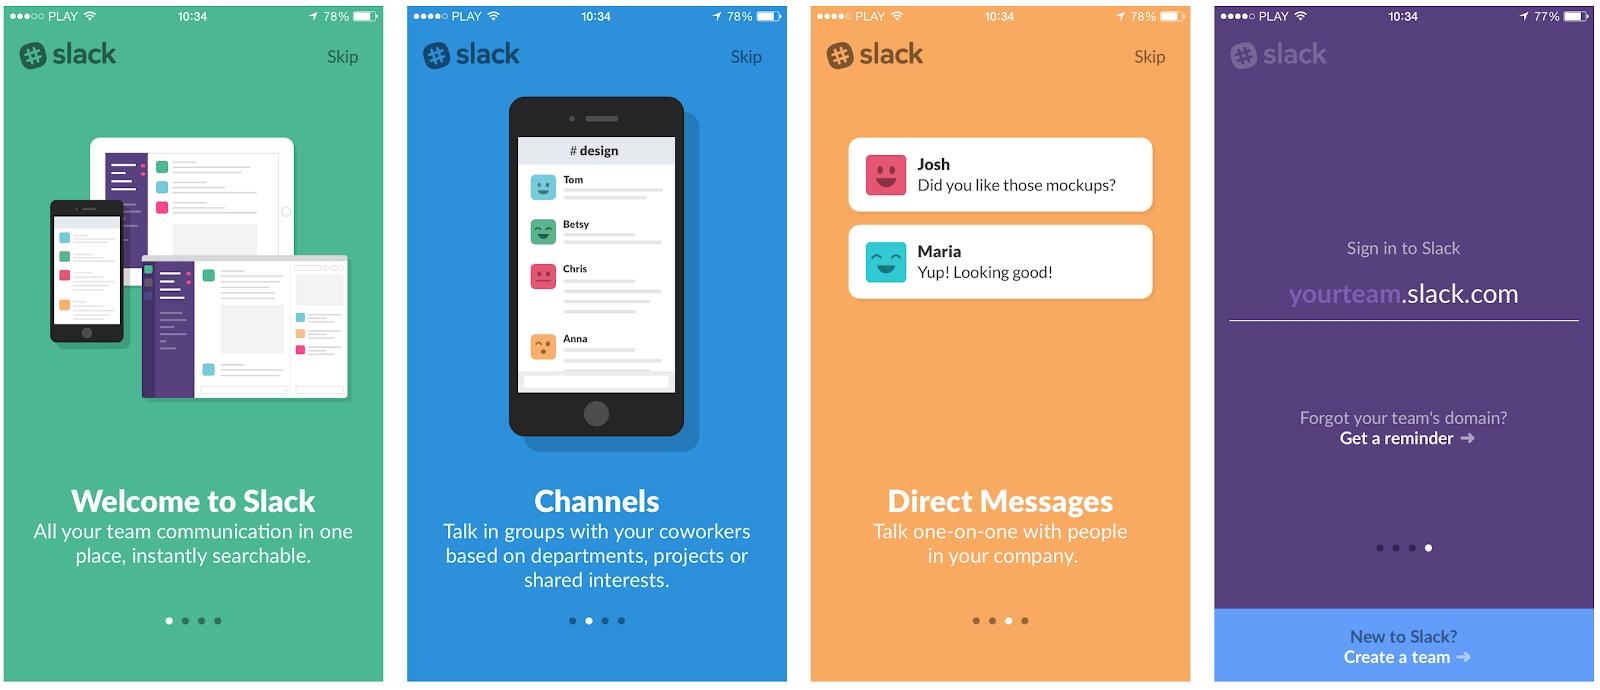 slack mobile app onboarding experience